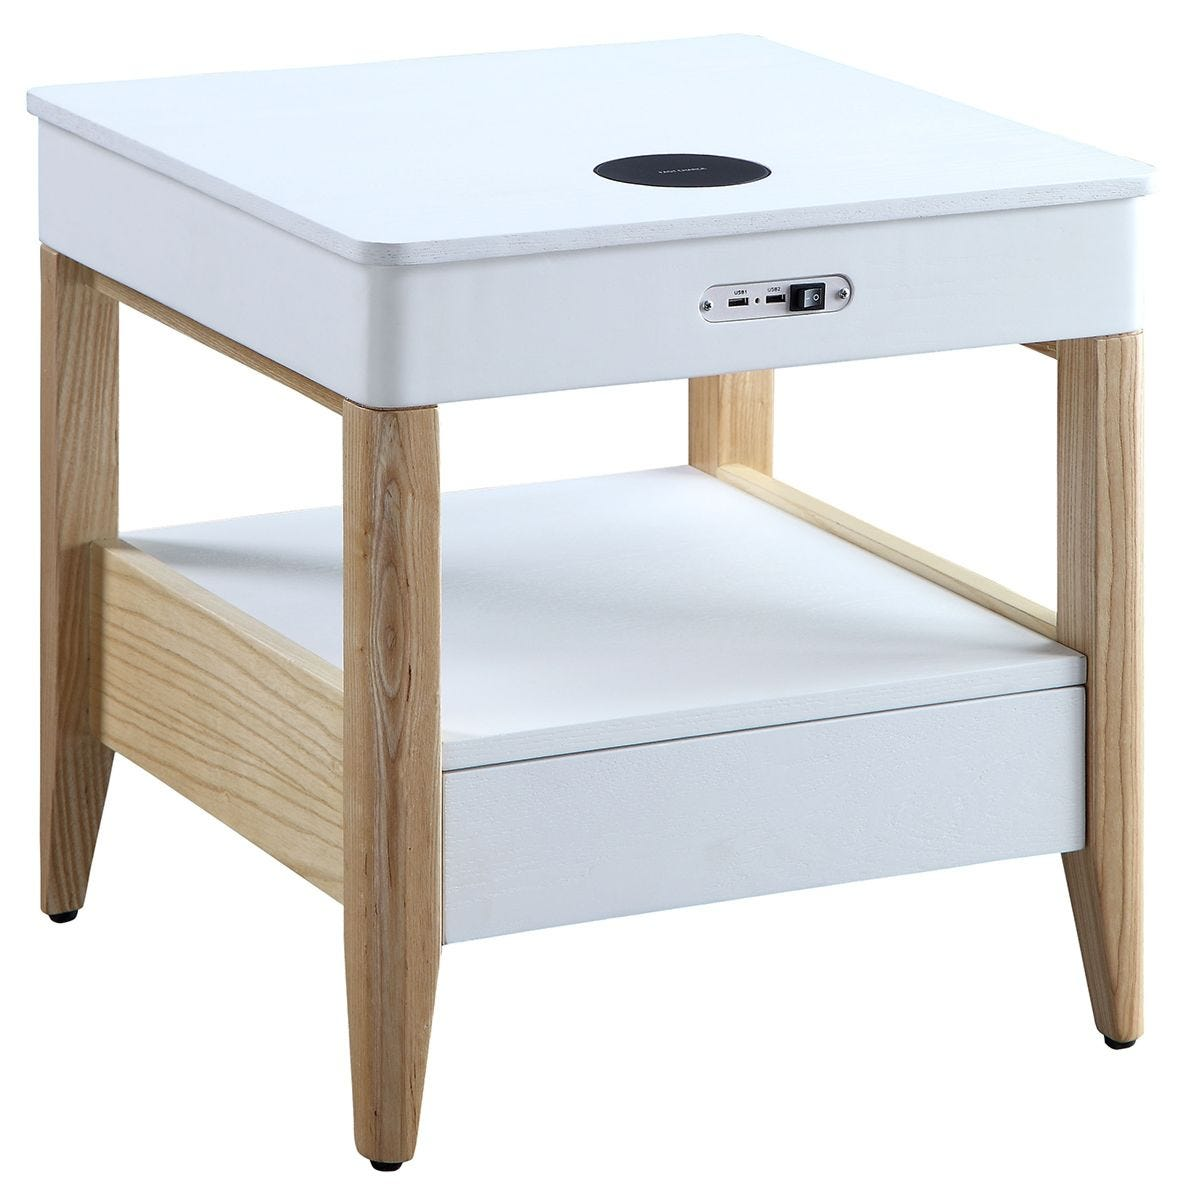 Jual San Francisco Ash/White Smart Bedside Table - Wireless Charger & Speaker